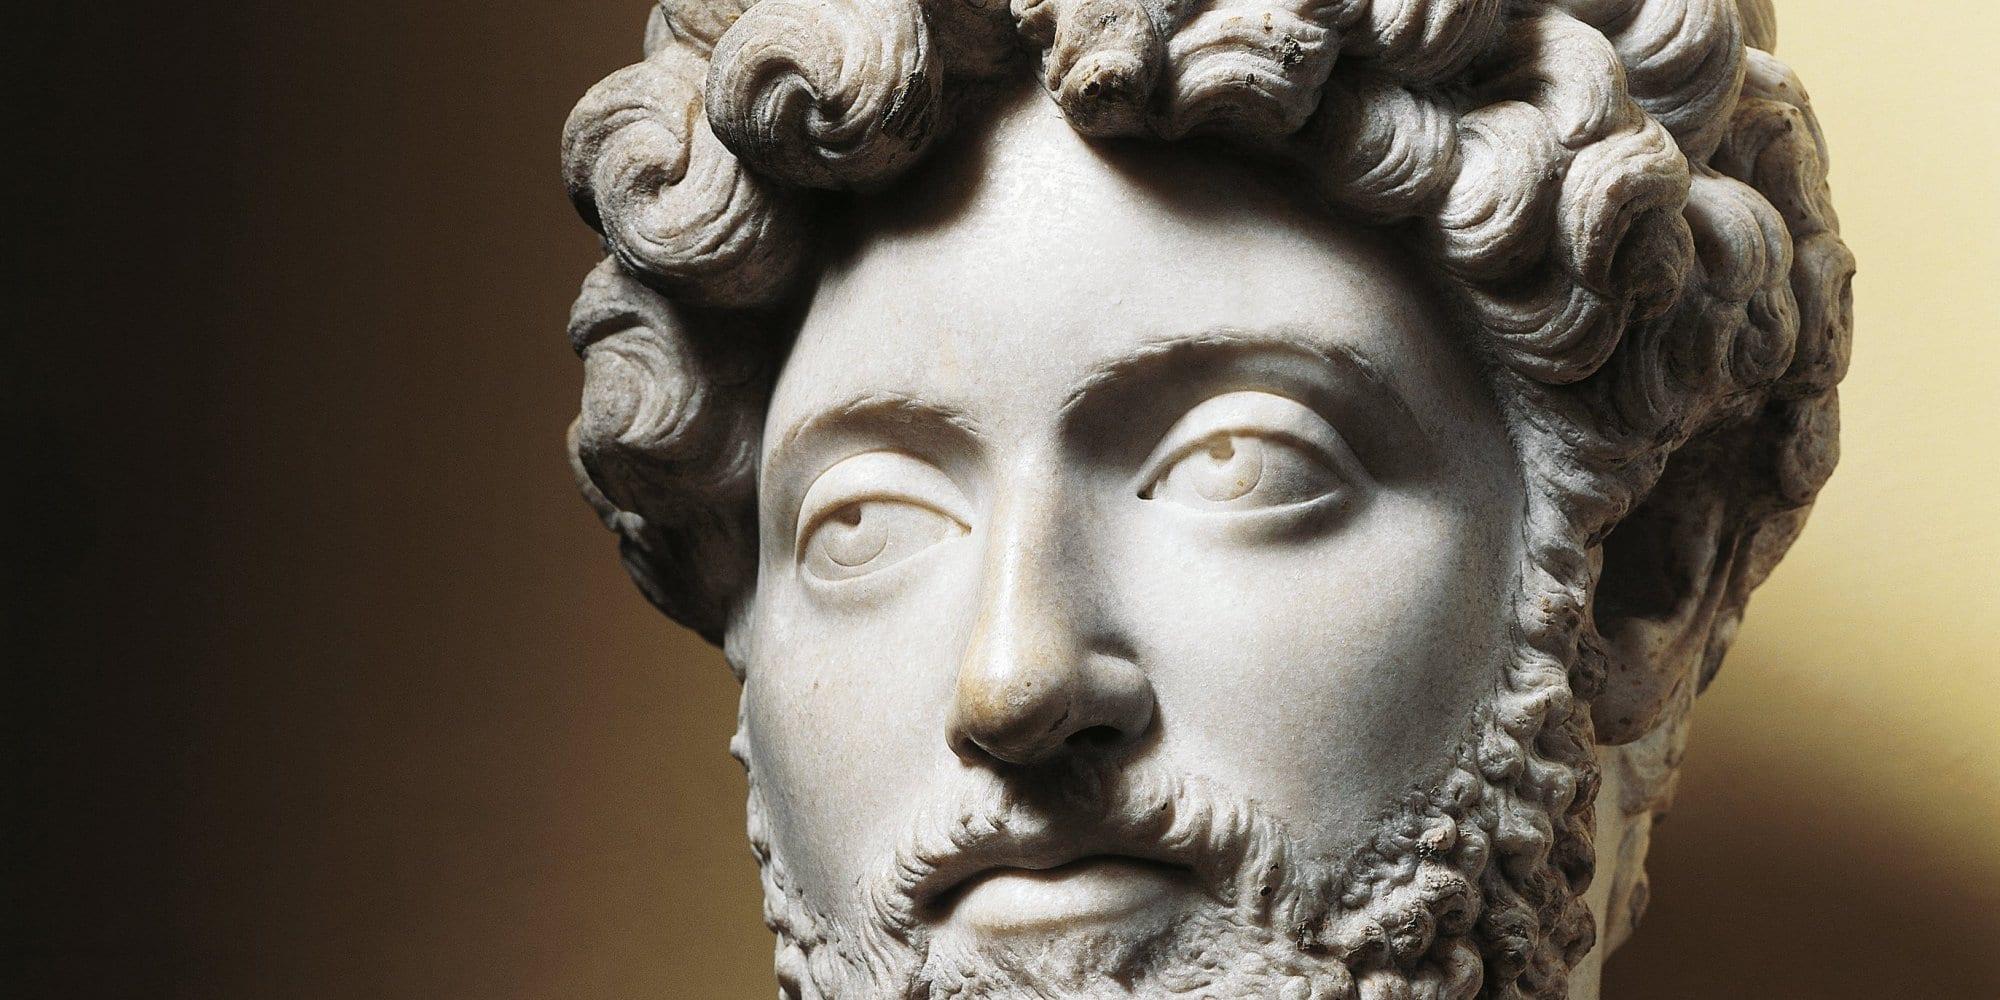 UNSPECIFIED - CIRCA 1900:  Roman civilization, 2nd century A.D. Bust of Emperor Marcus Aurelius.  (Photo By DEA / G. NIMATALLAH/De Agostini/Getty Images)